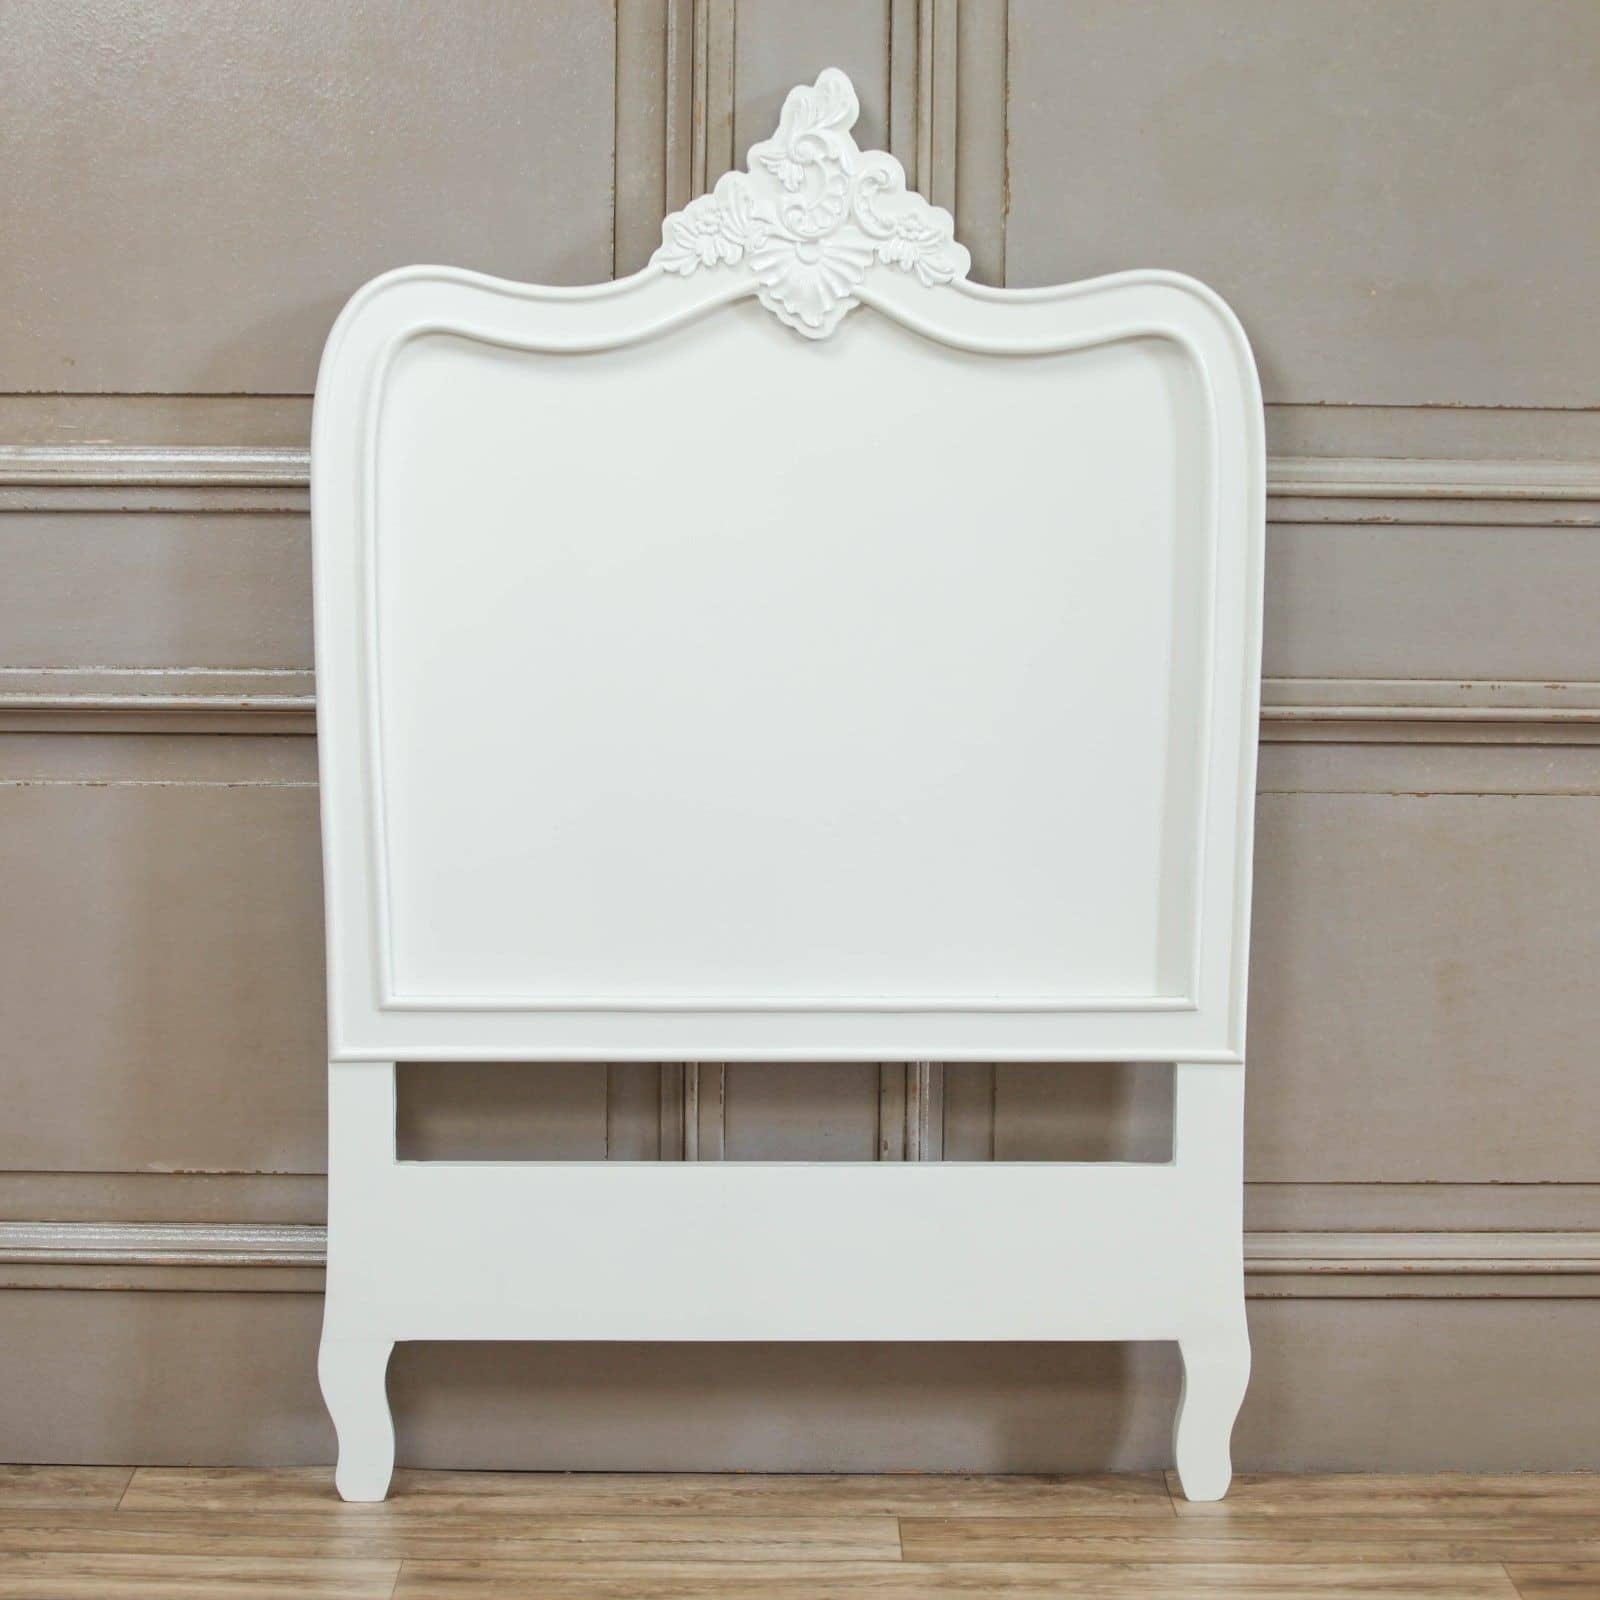 French White 3ft Single Headboard Furniture La Maison Chic Luxury Interiors